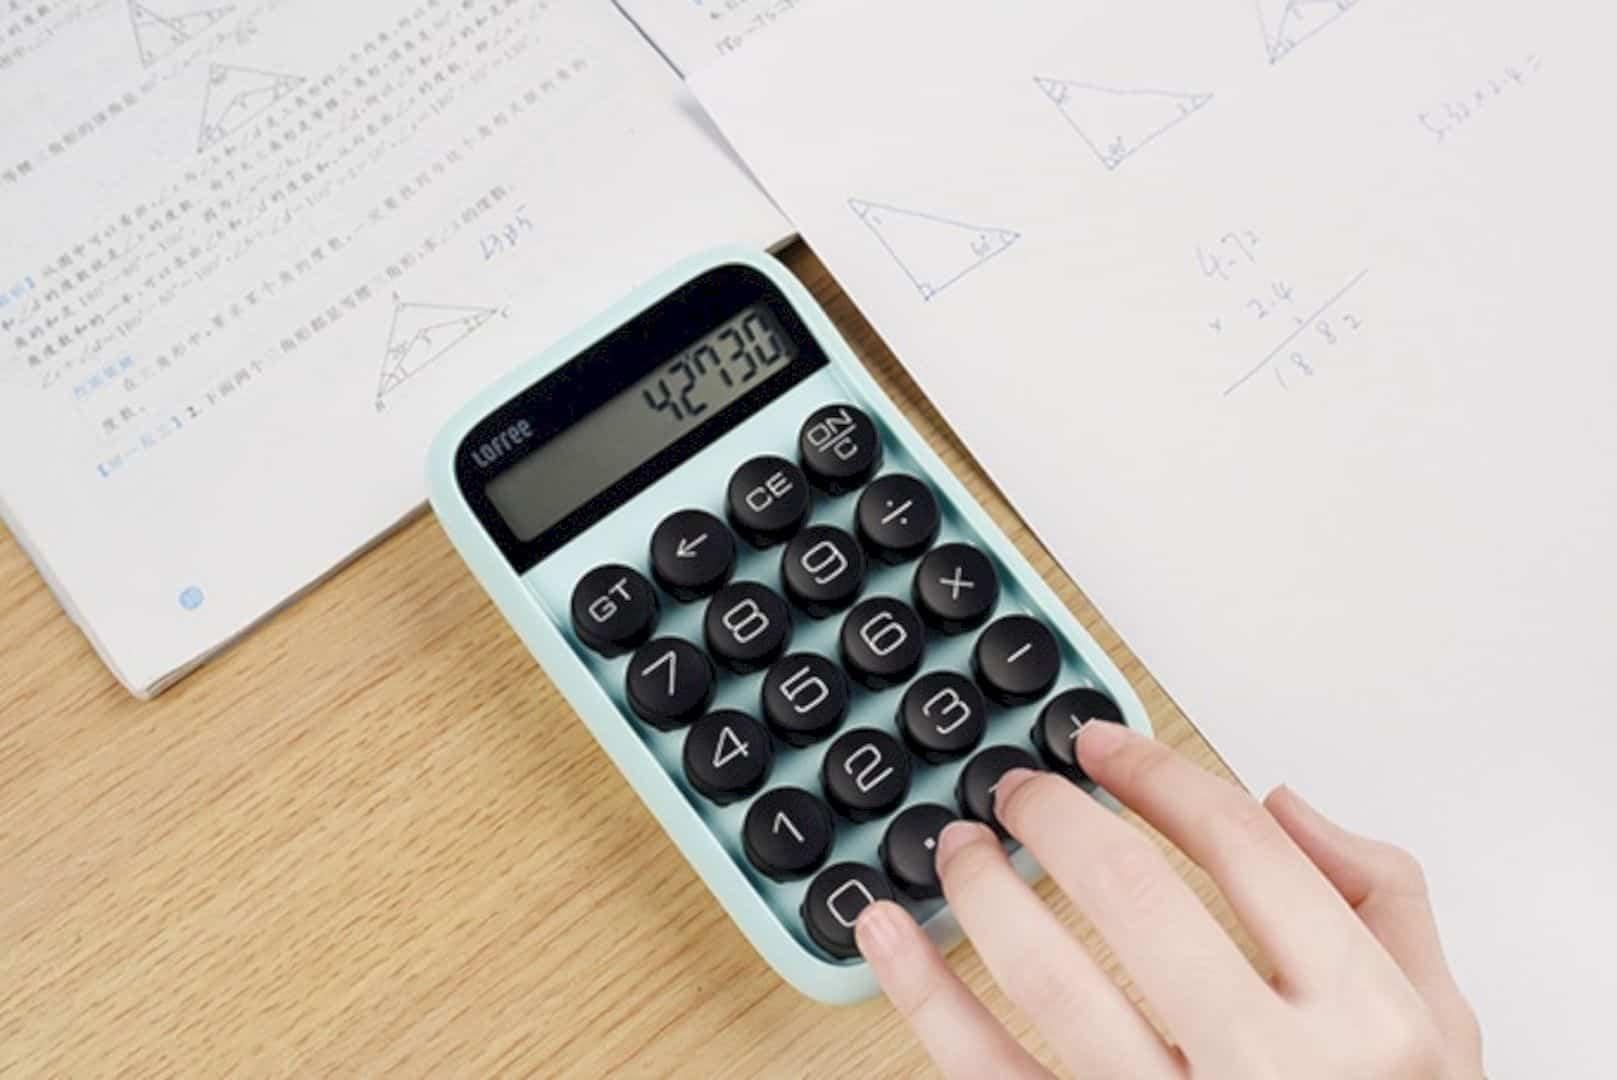 Lofree Digit Calculator 5